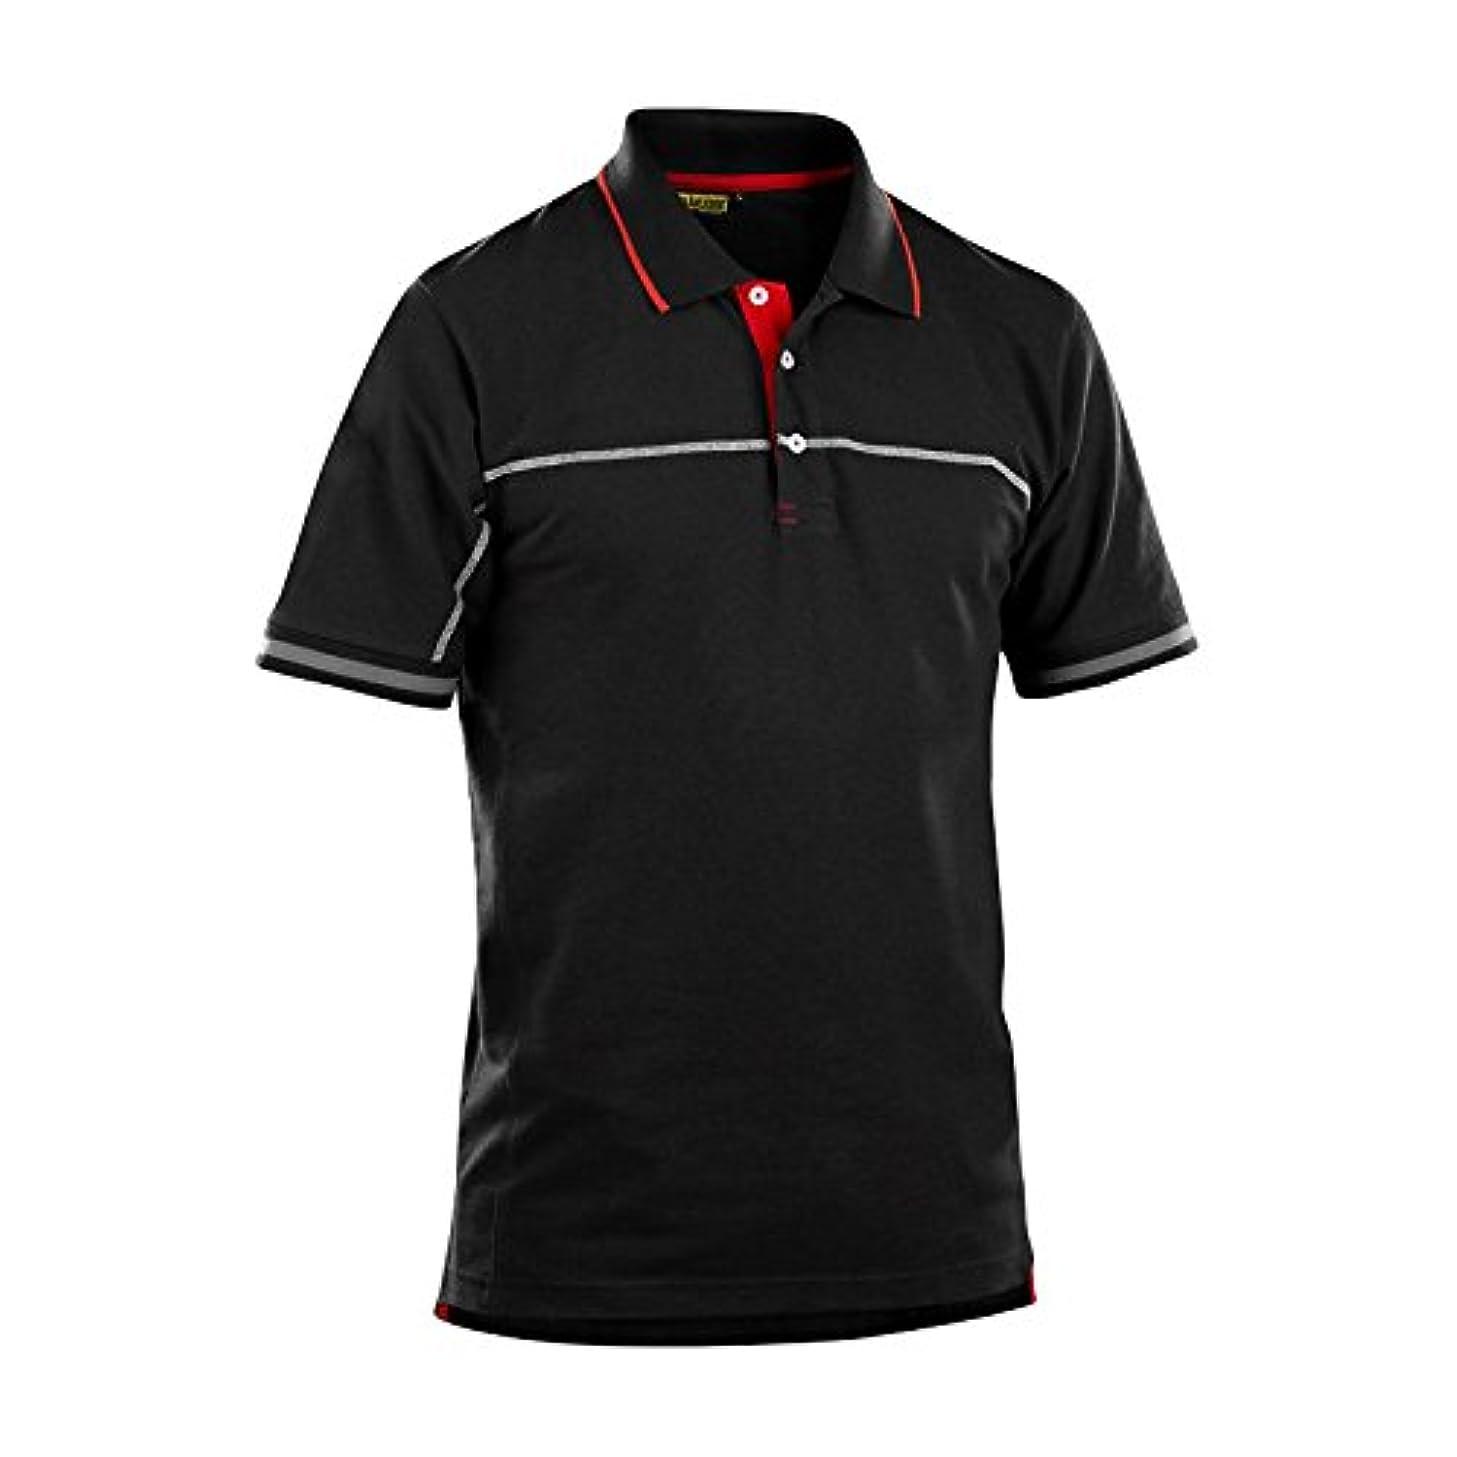 Blaklader 338910509956XXL Polo Shirt, XX-Large, Black/Red